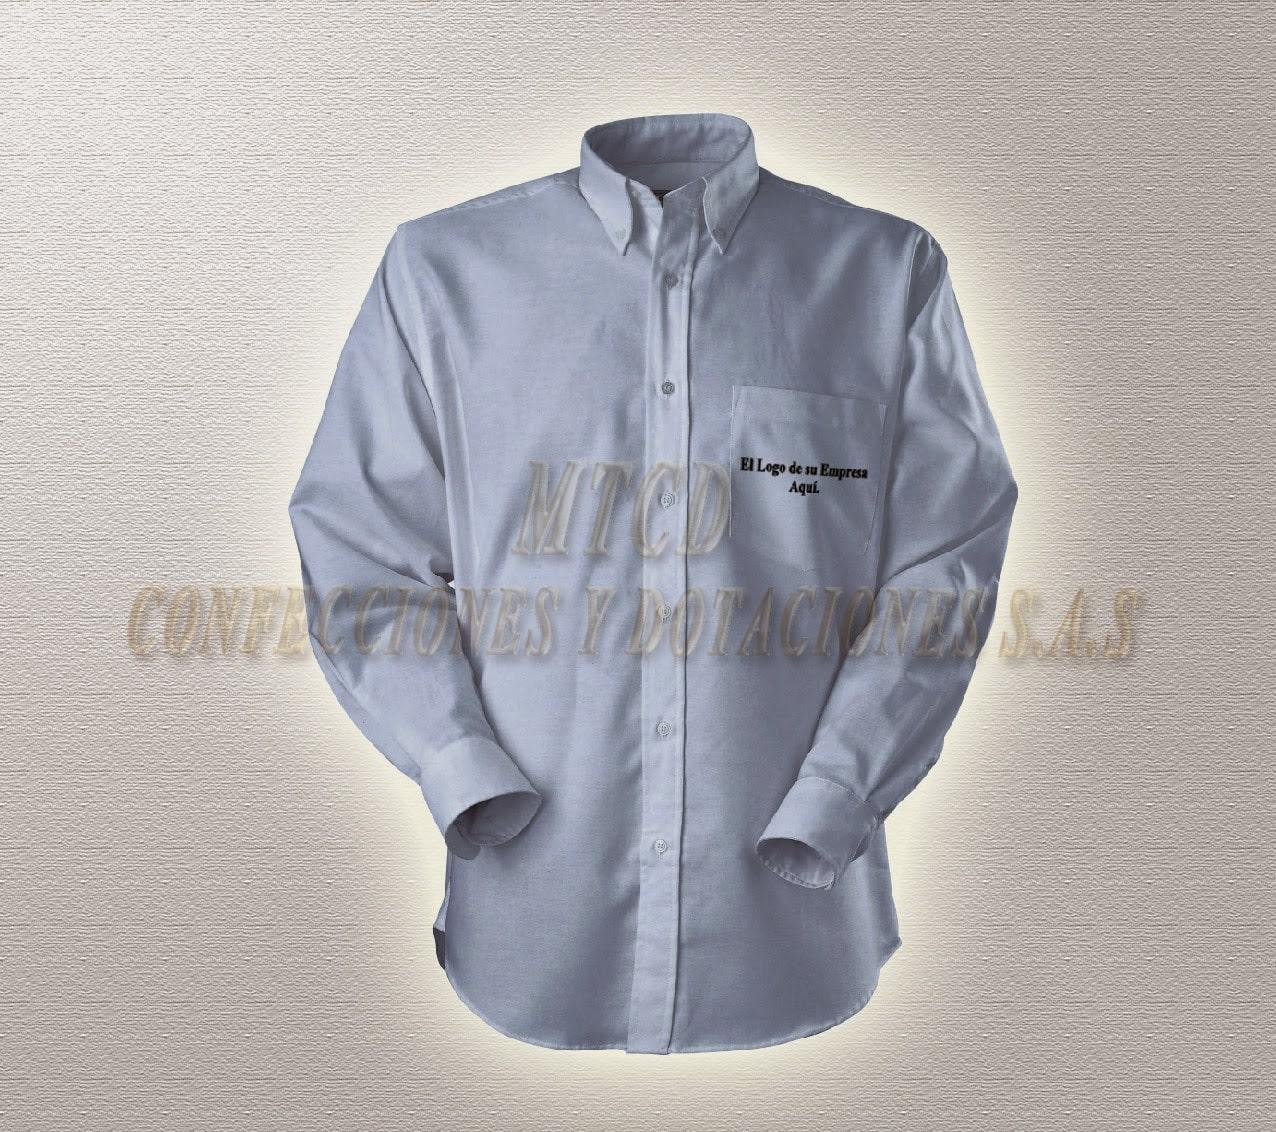 Camisas para hombre personalizadas